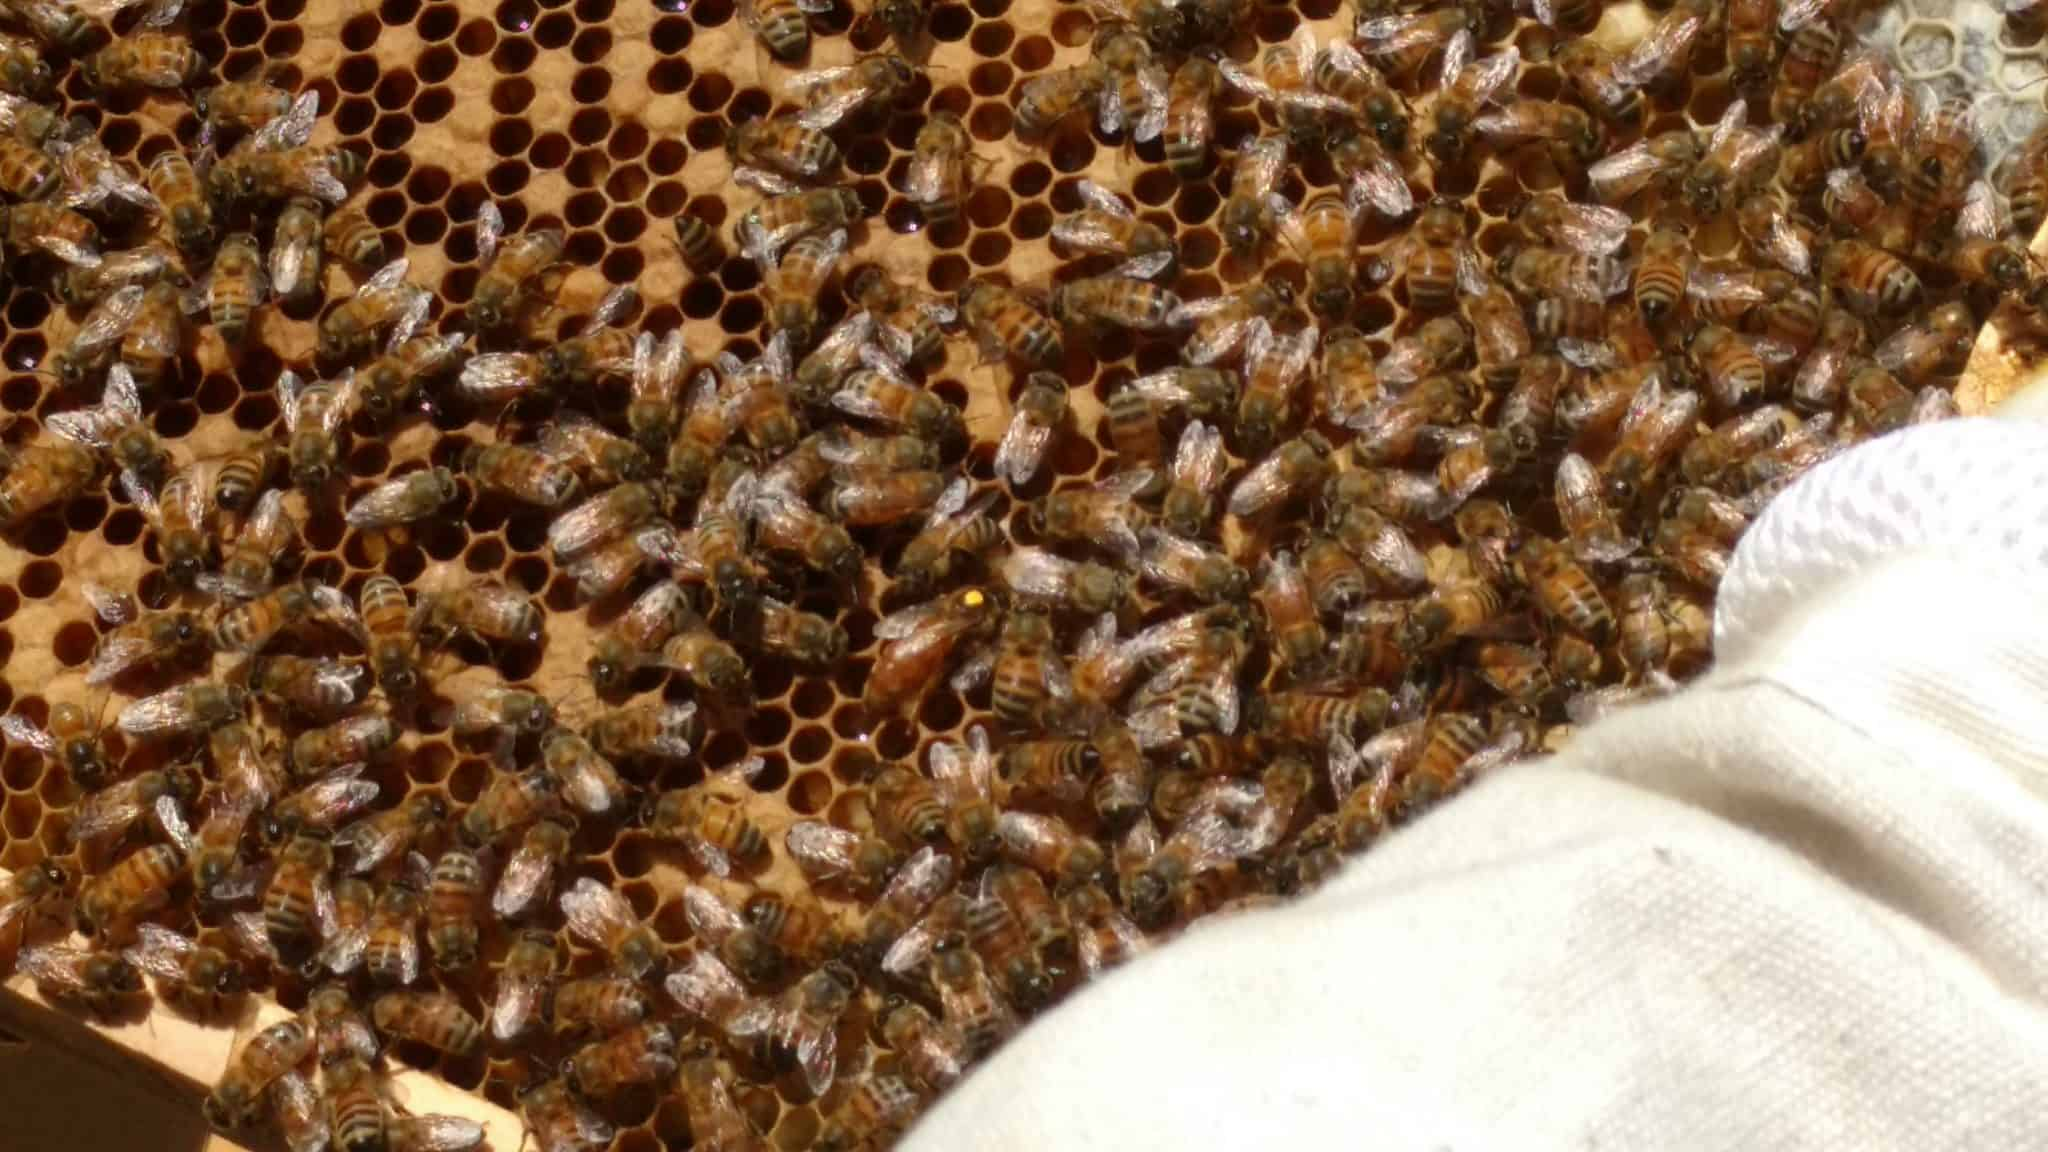 when beekeeping goes wrong perfectbee